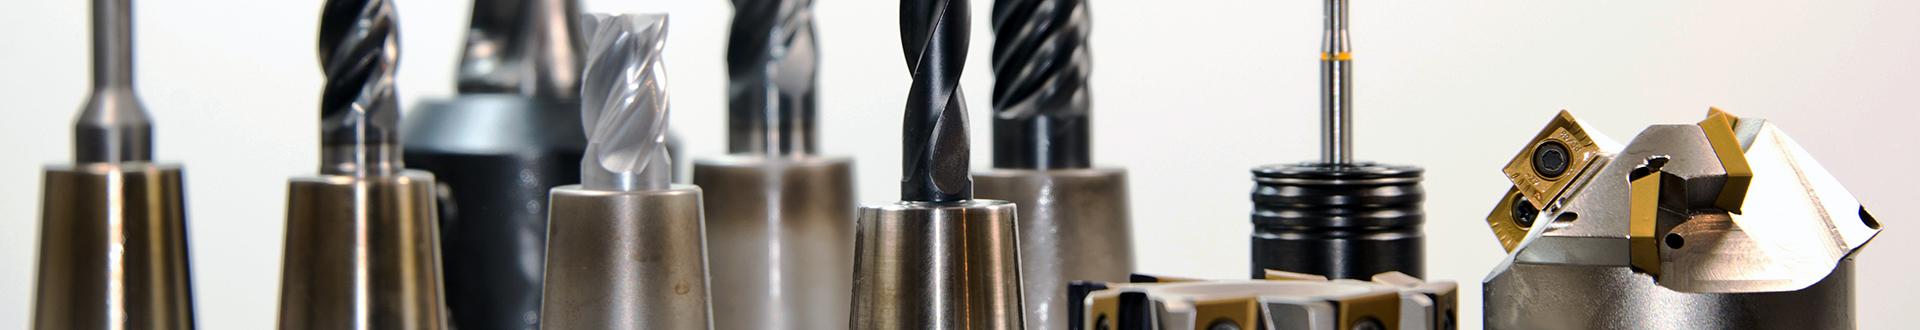 precision machine tool holders